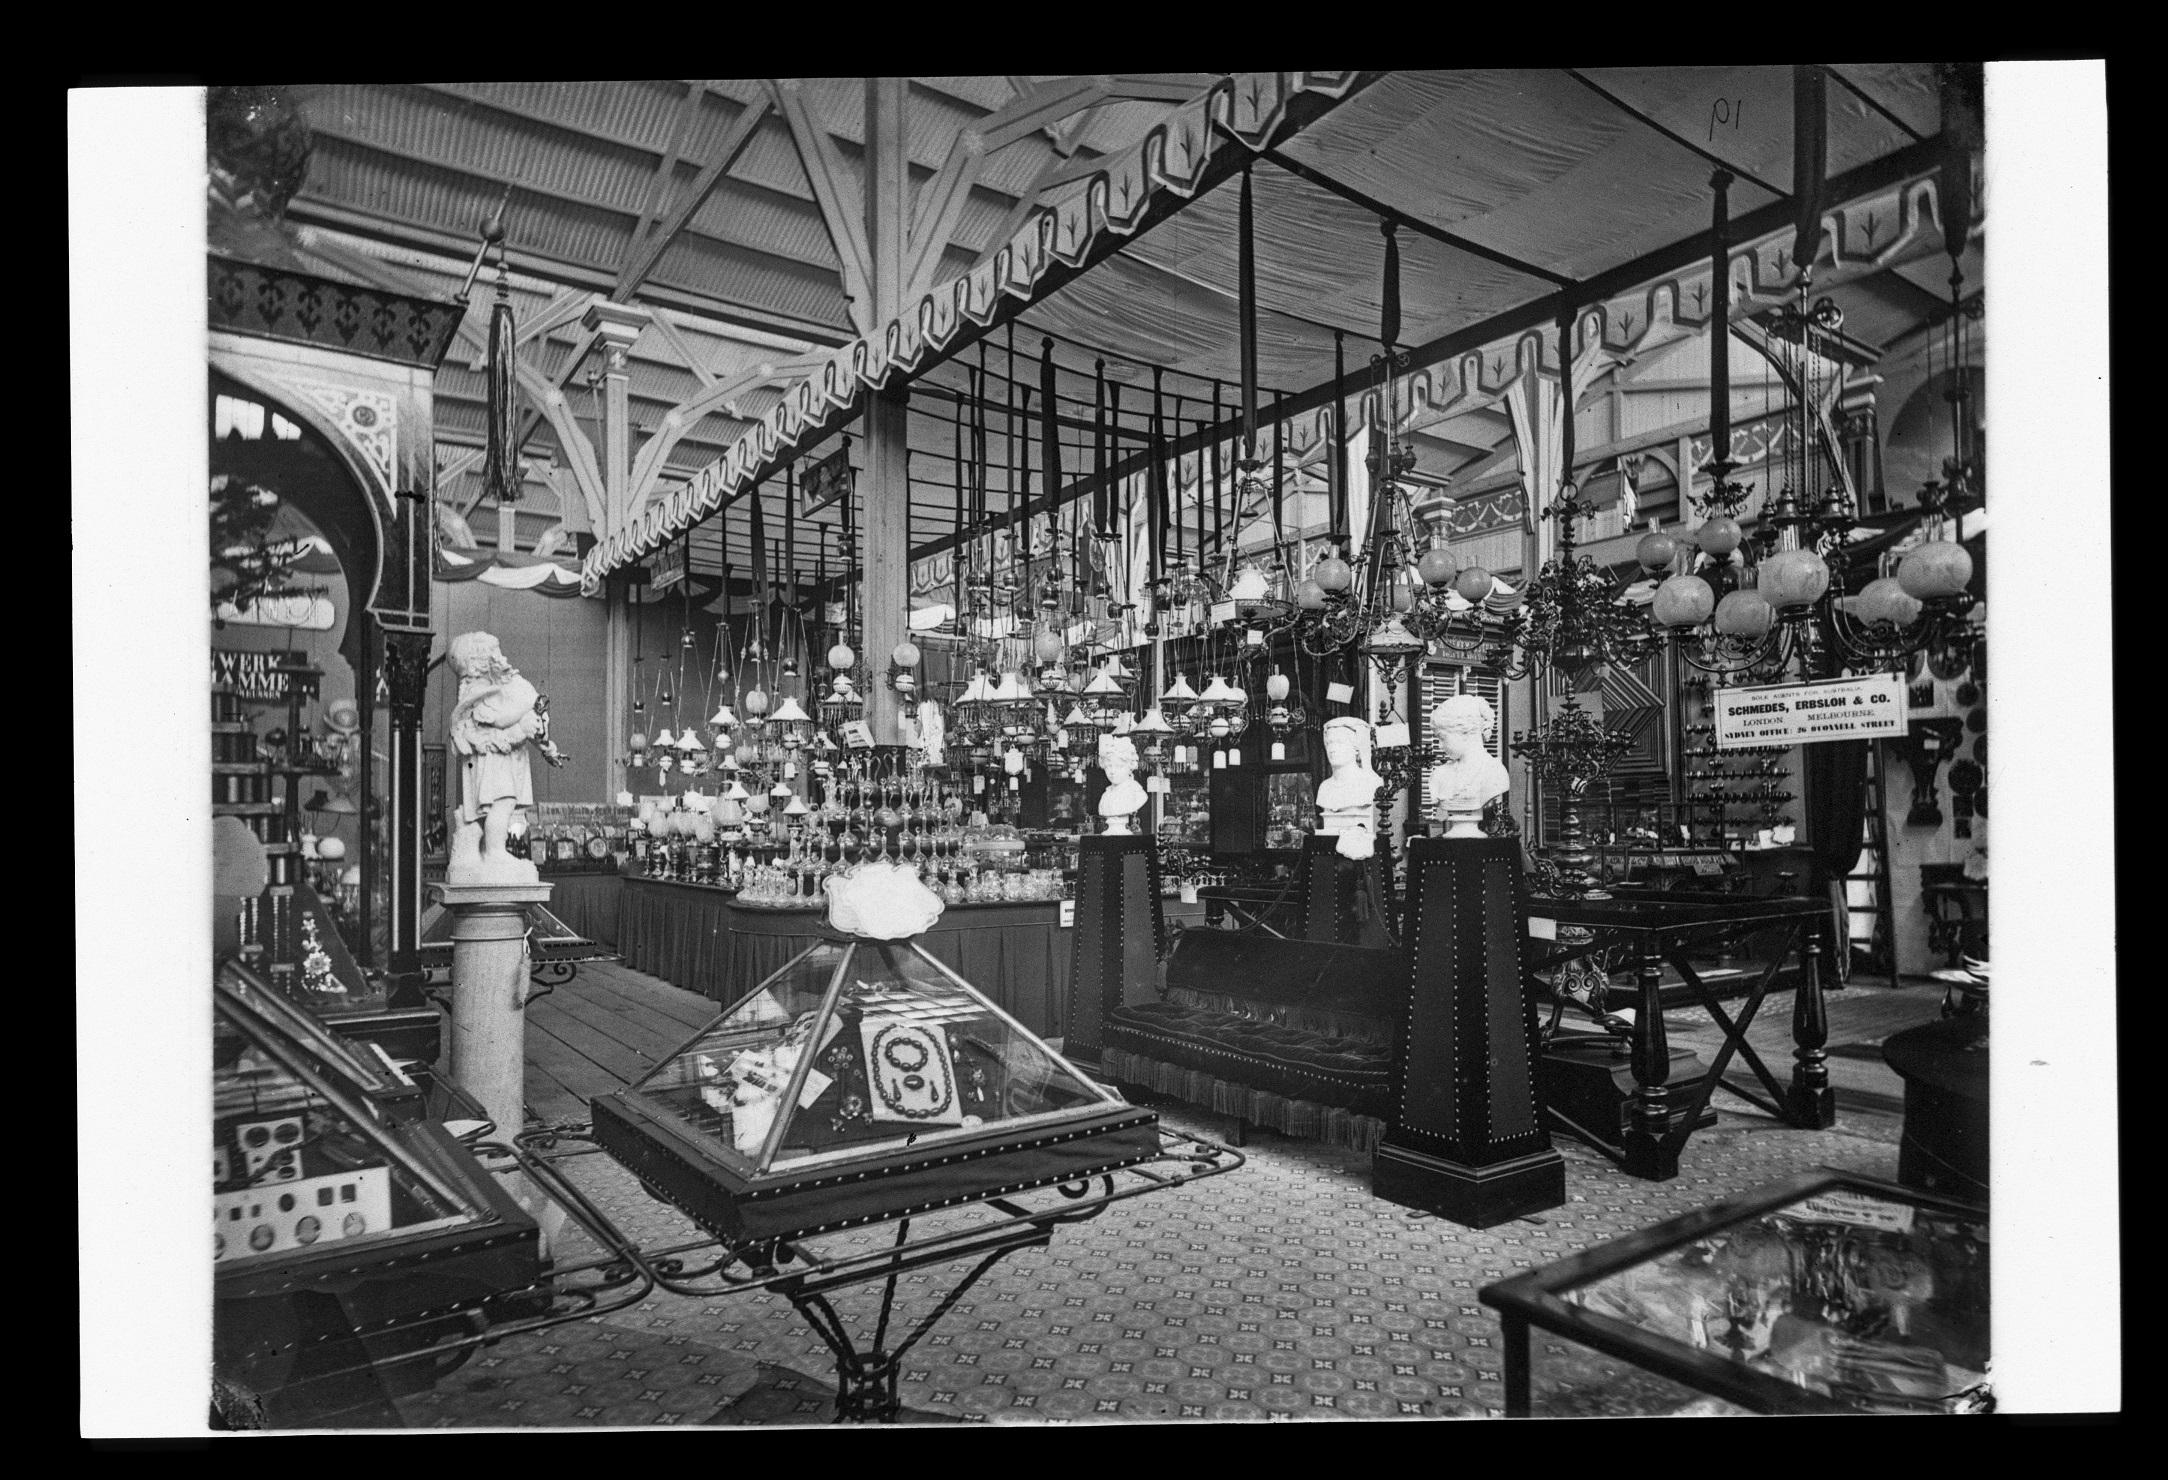 Exhibits, International Exhibition, Sydney, 1879-80